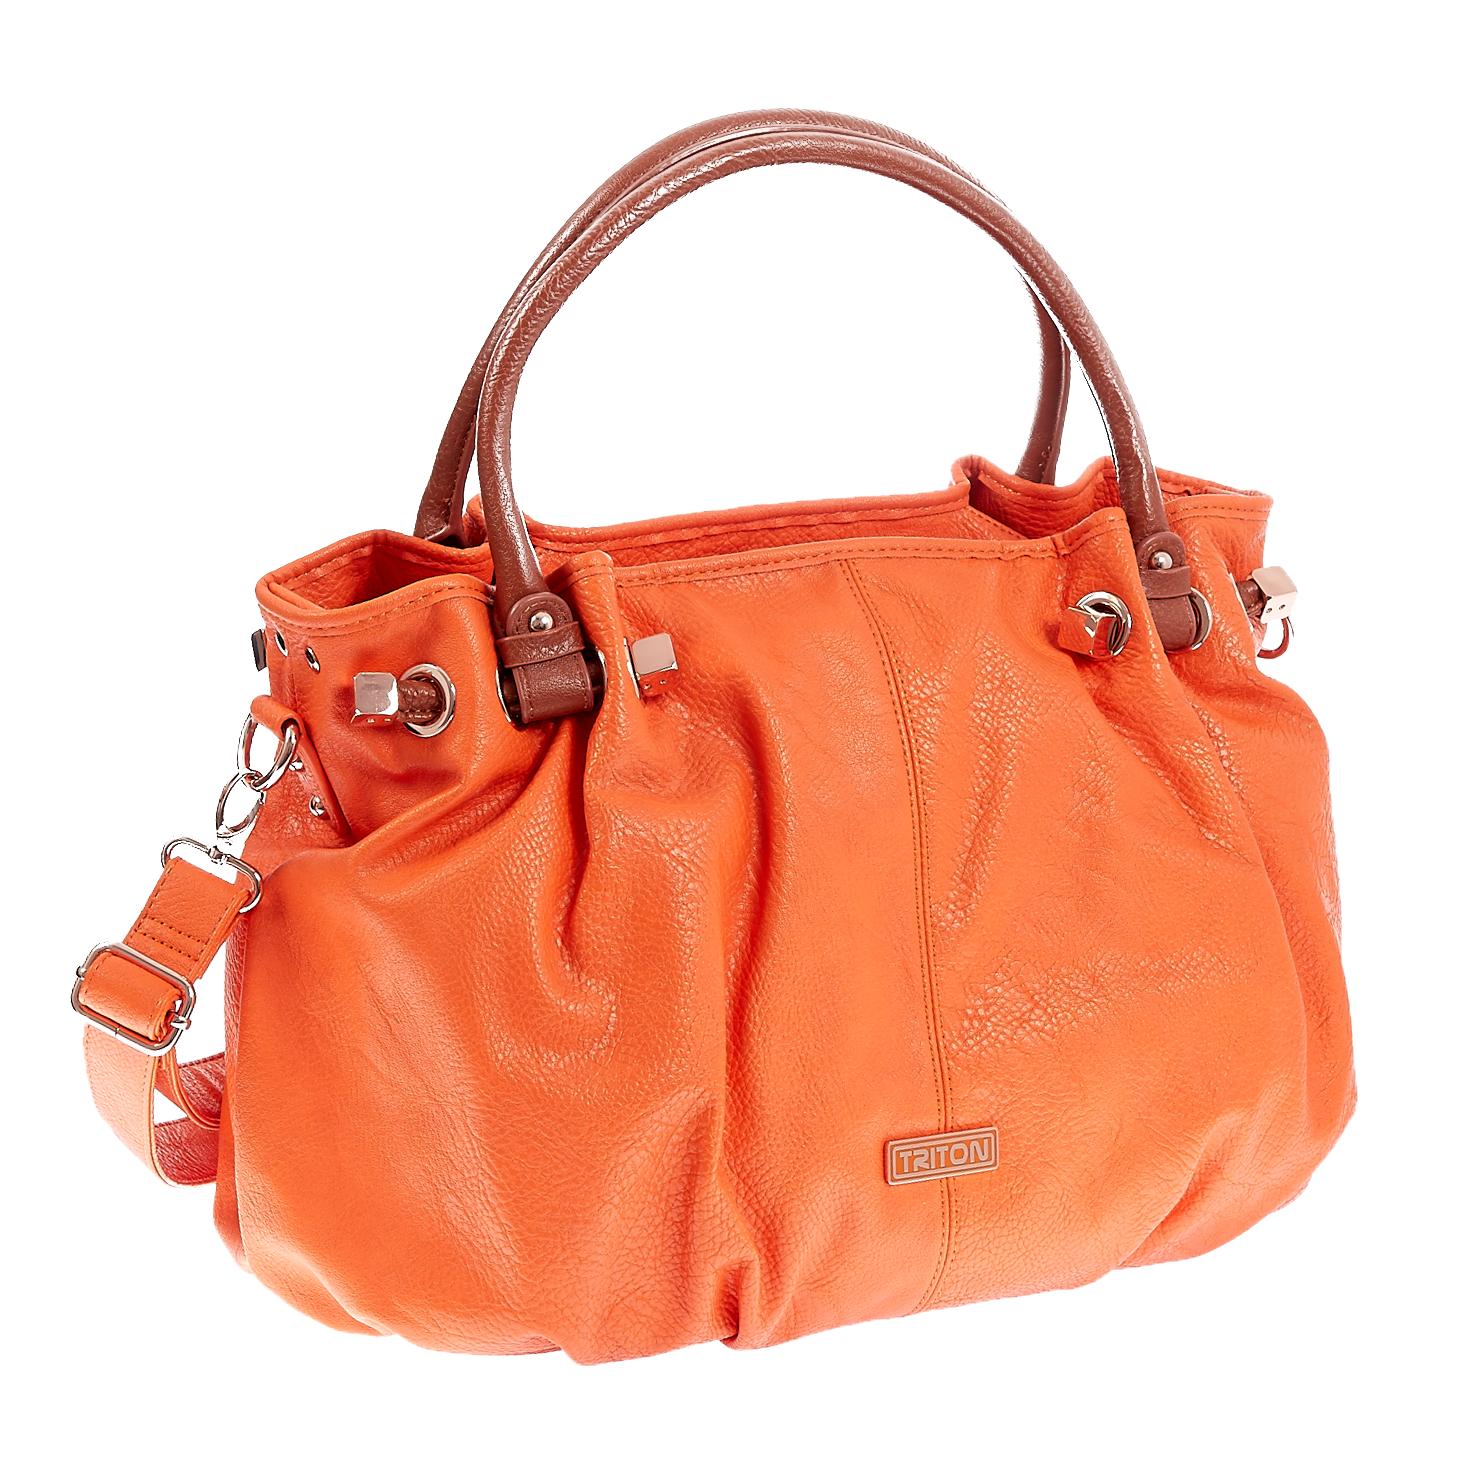 TRITON – Γυναικεία τσάντα Triton πορτοκαλί 1441212.0-0000